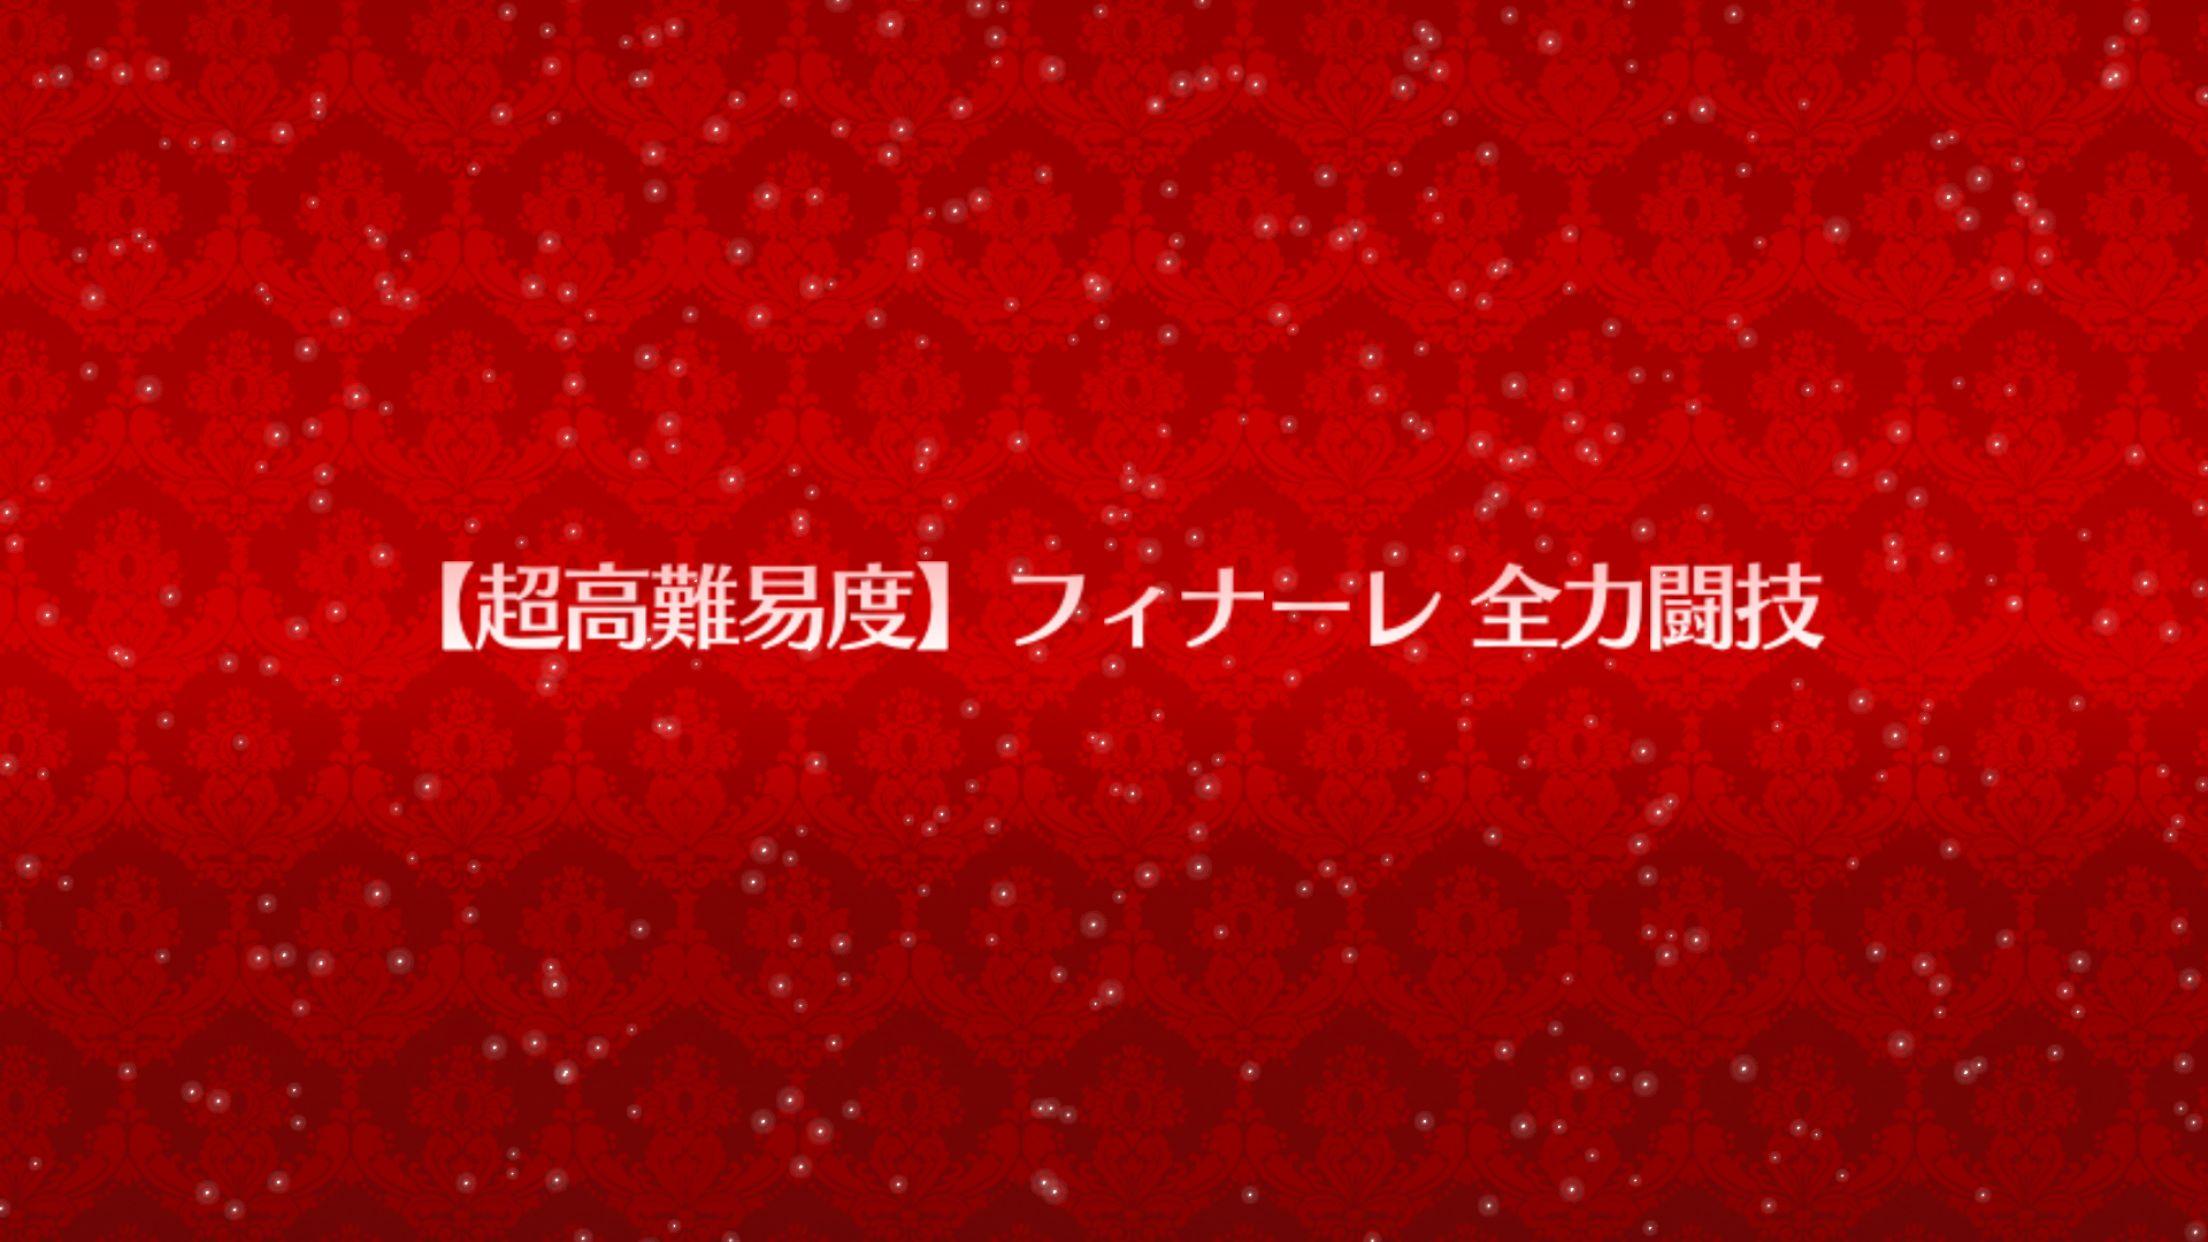 【FGO】ネロ祭り エキシビションクエスト フィナーレ 全力闘技 全力攻略